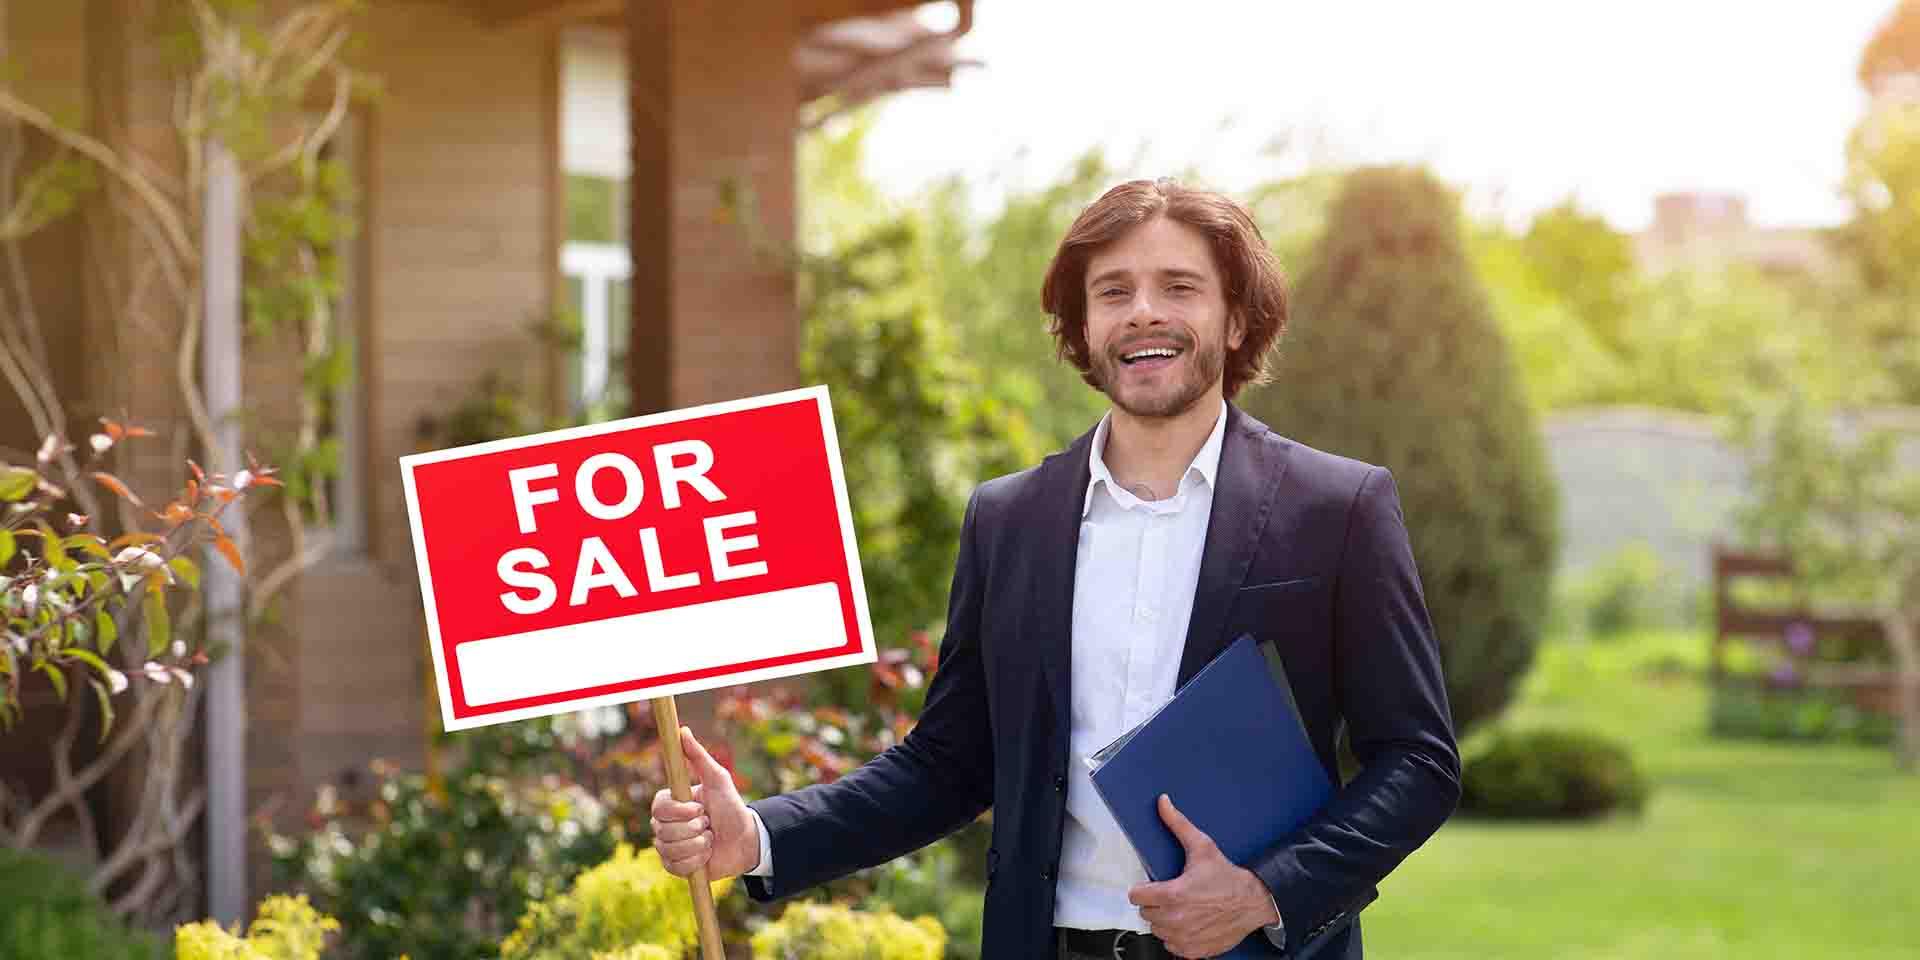 property investment morebyus1